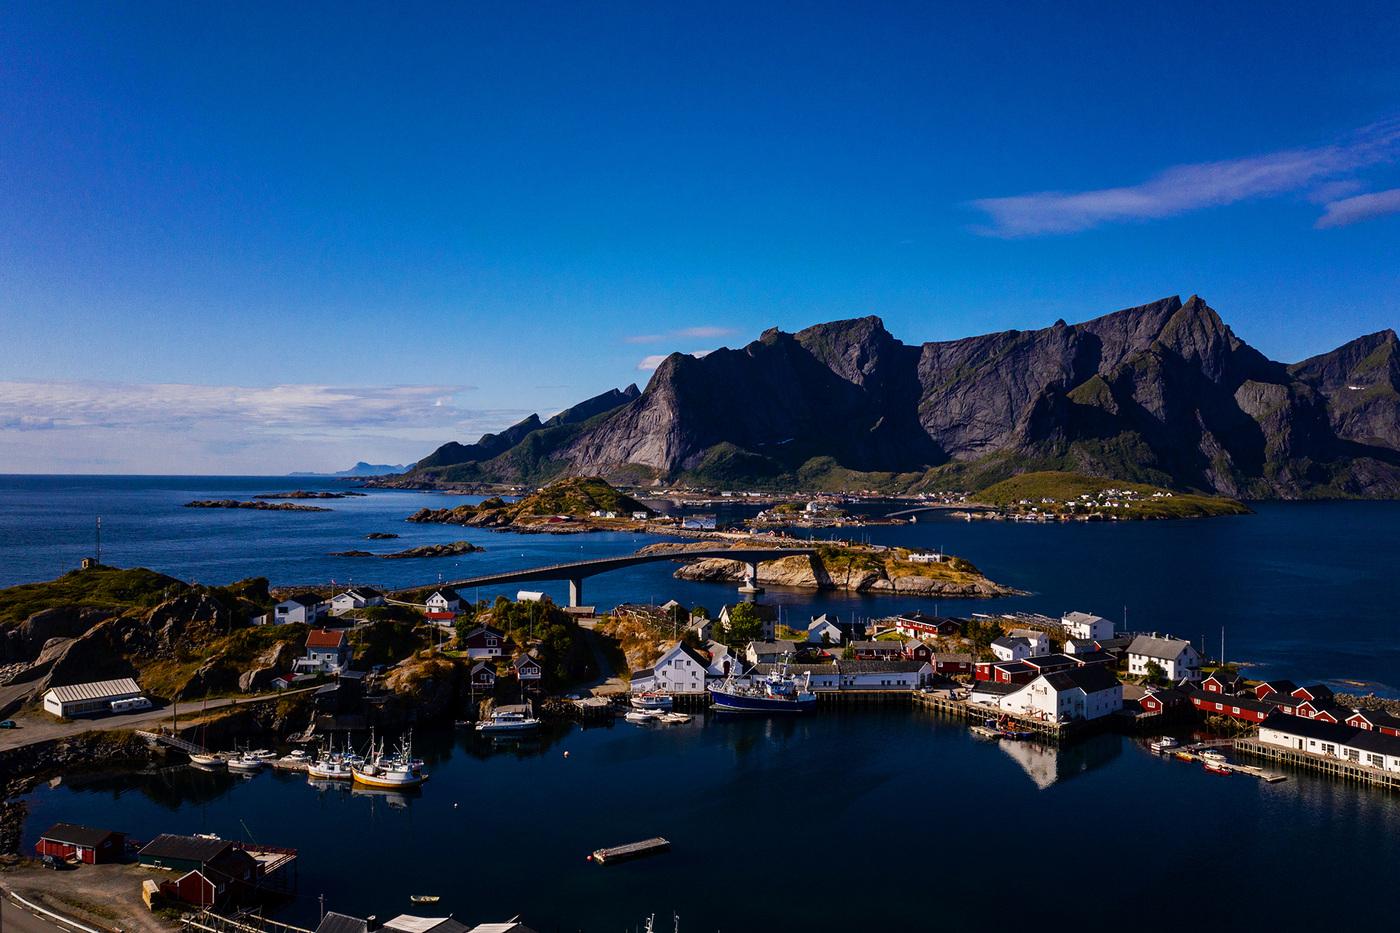 Helen Shippey - Lofoten Norge